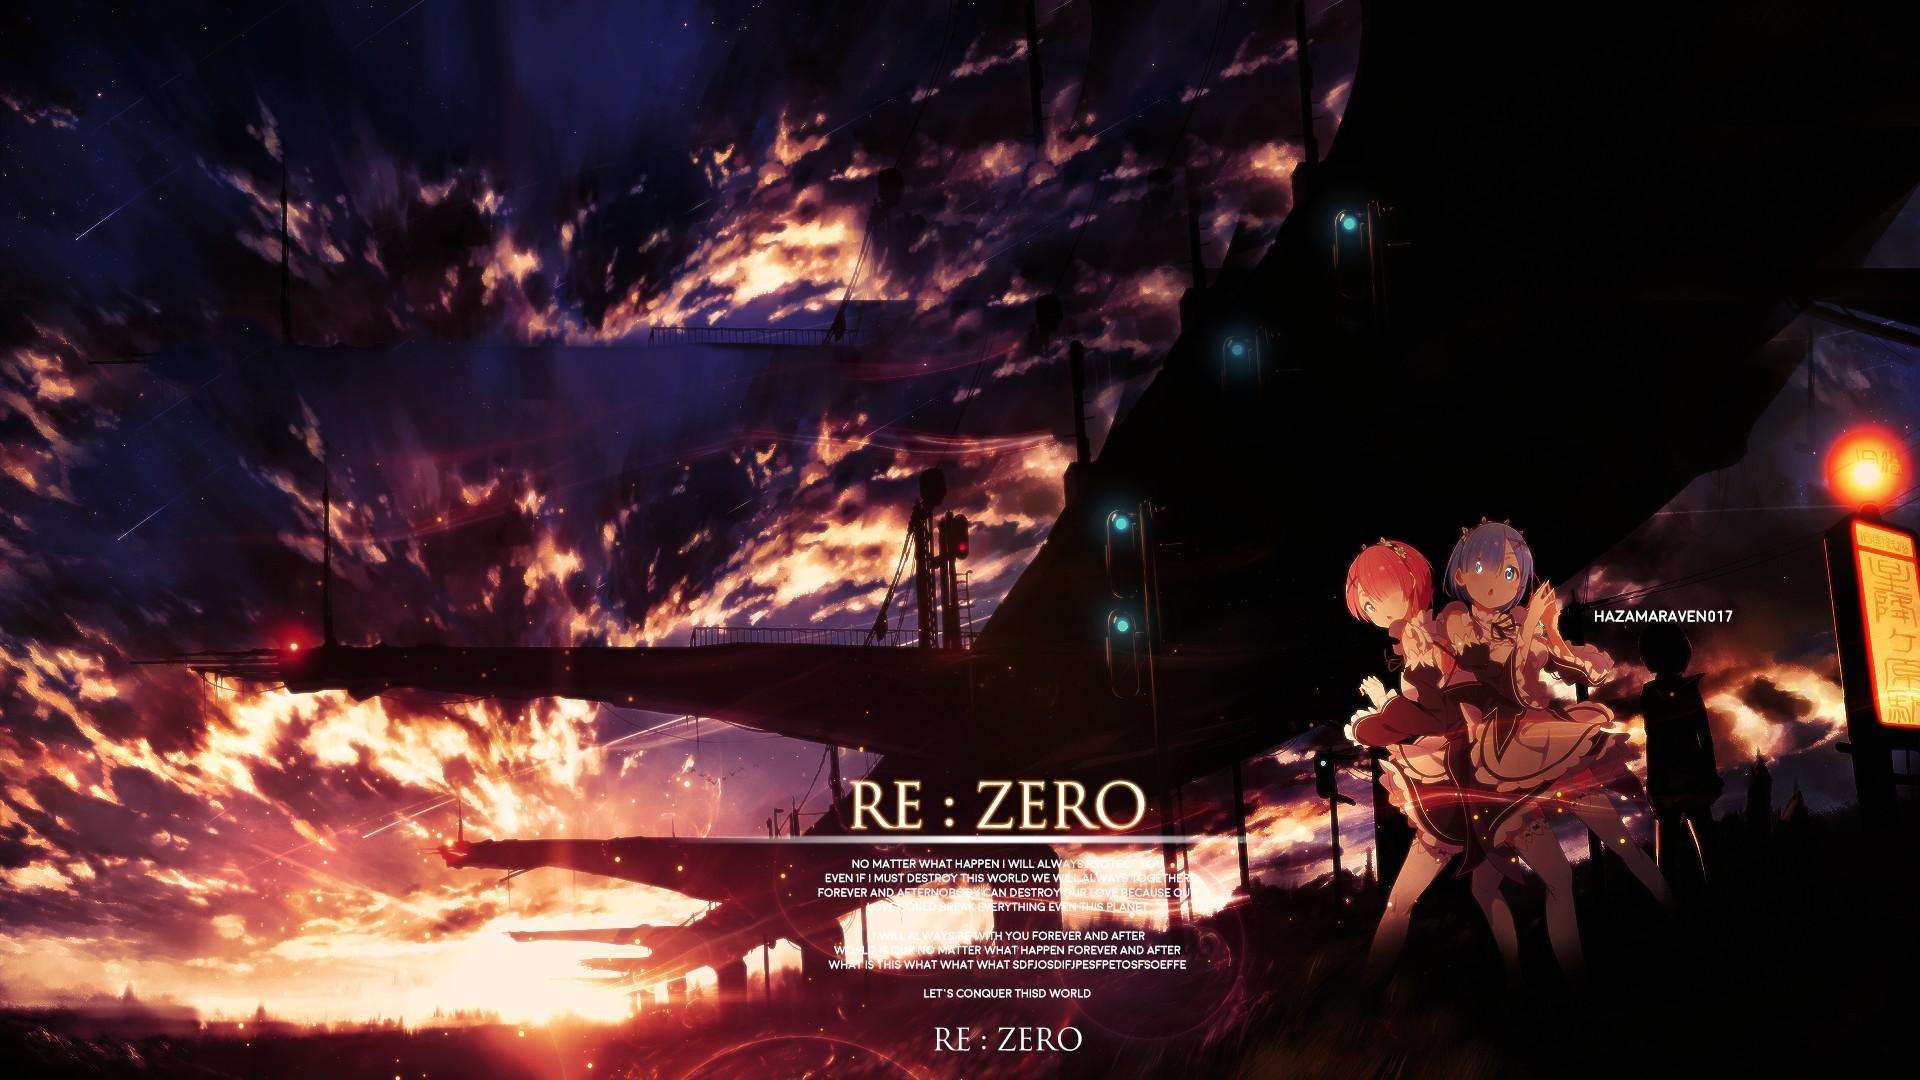 ReZero Wallpaper 1 Download Free Cool HD Wallpapers For Desktop